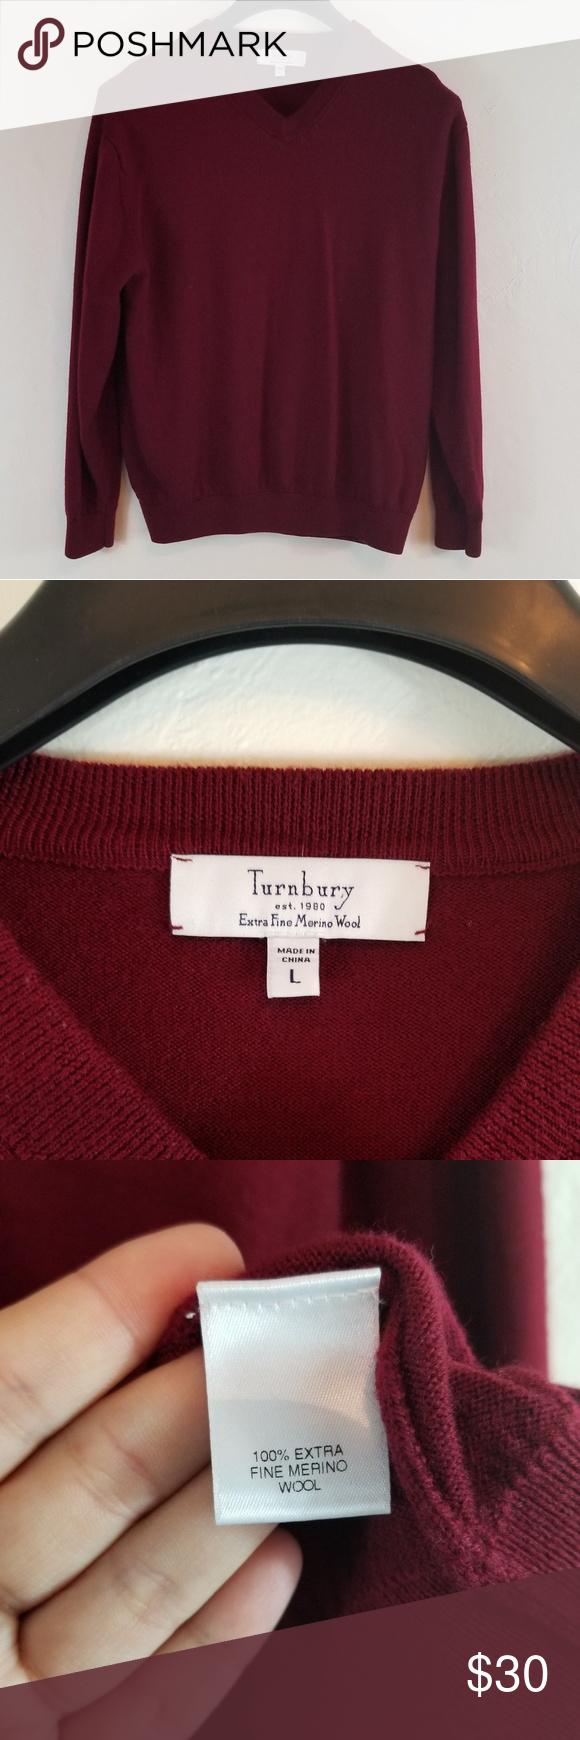 Turnbury extra fine merino wool, EUC (With images) | Merino